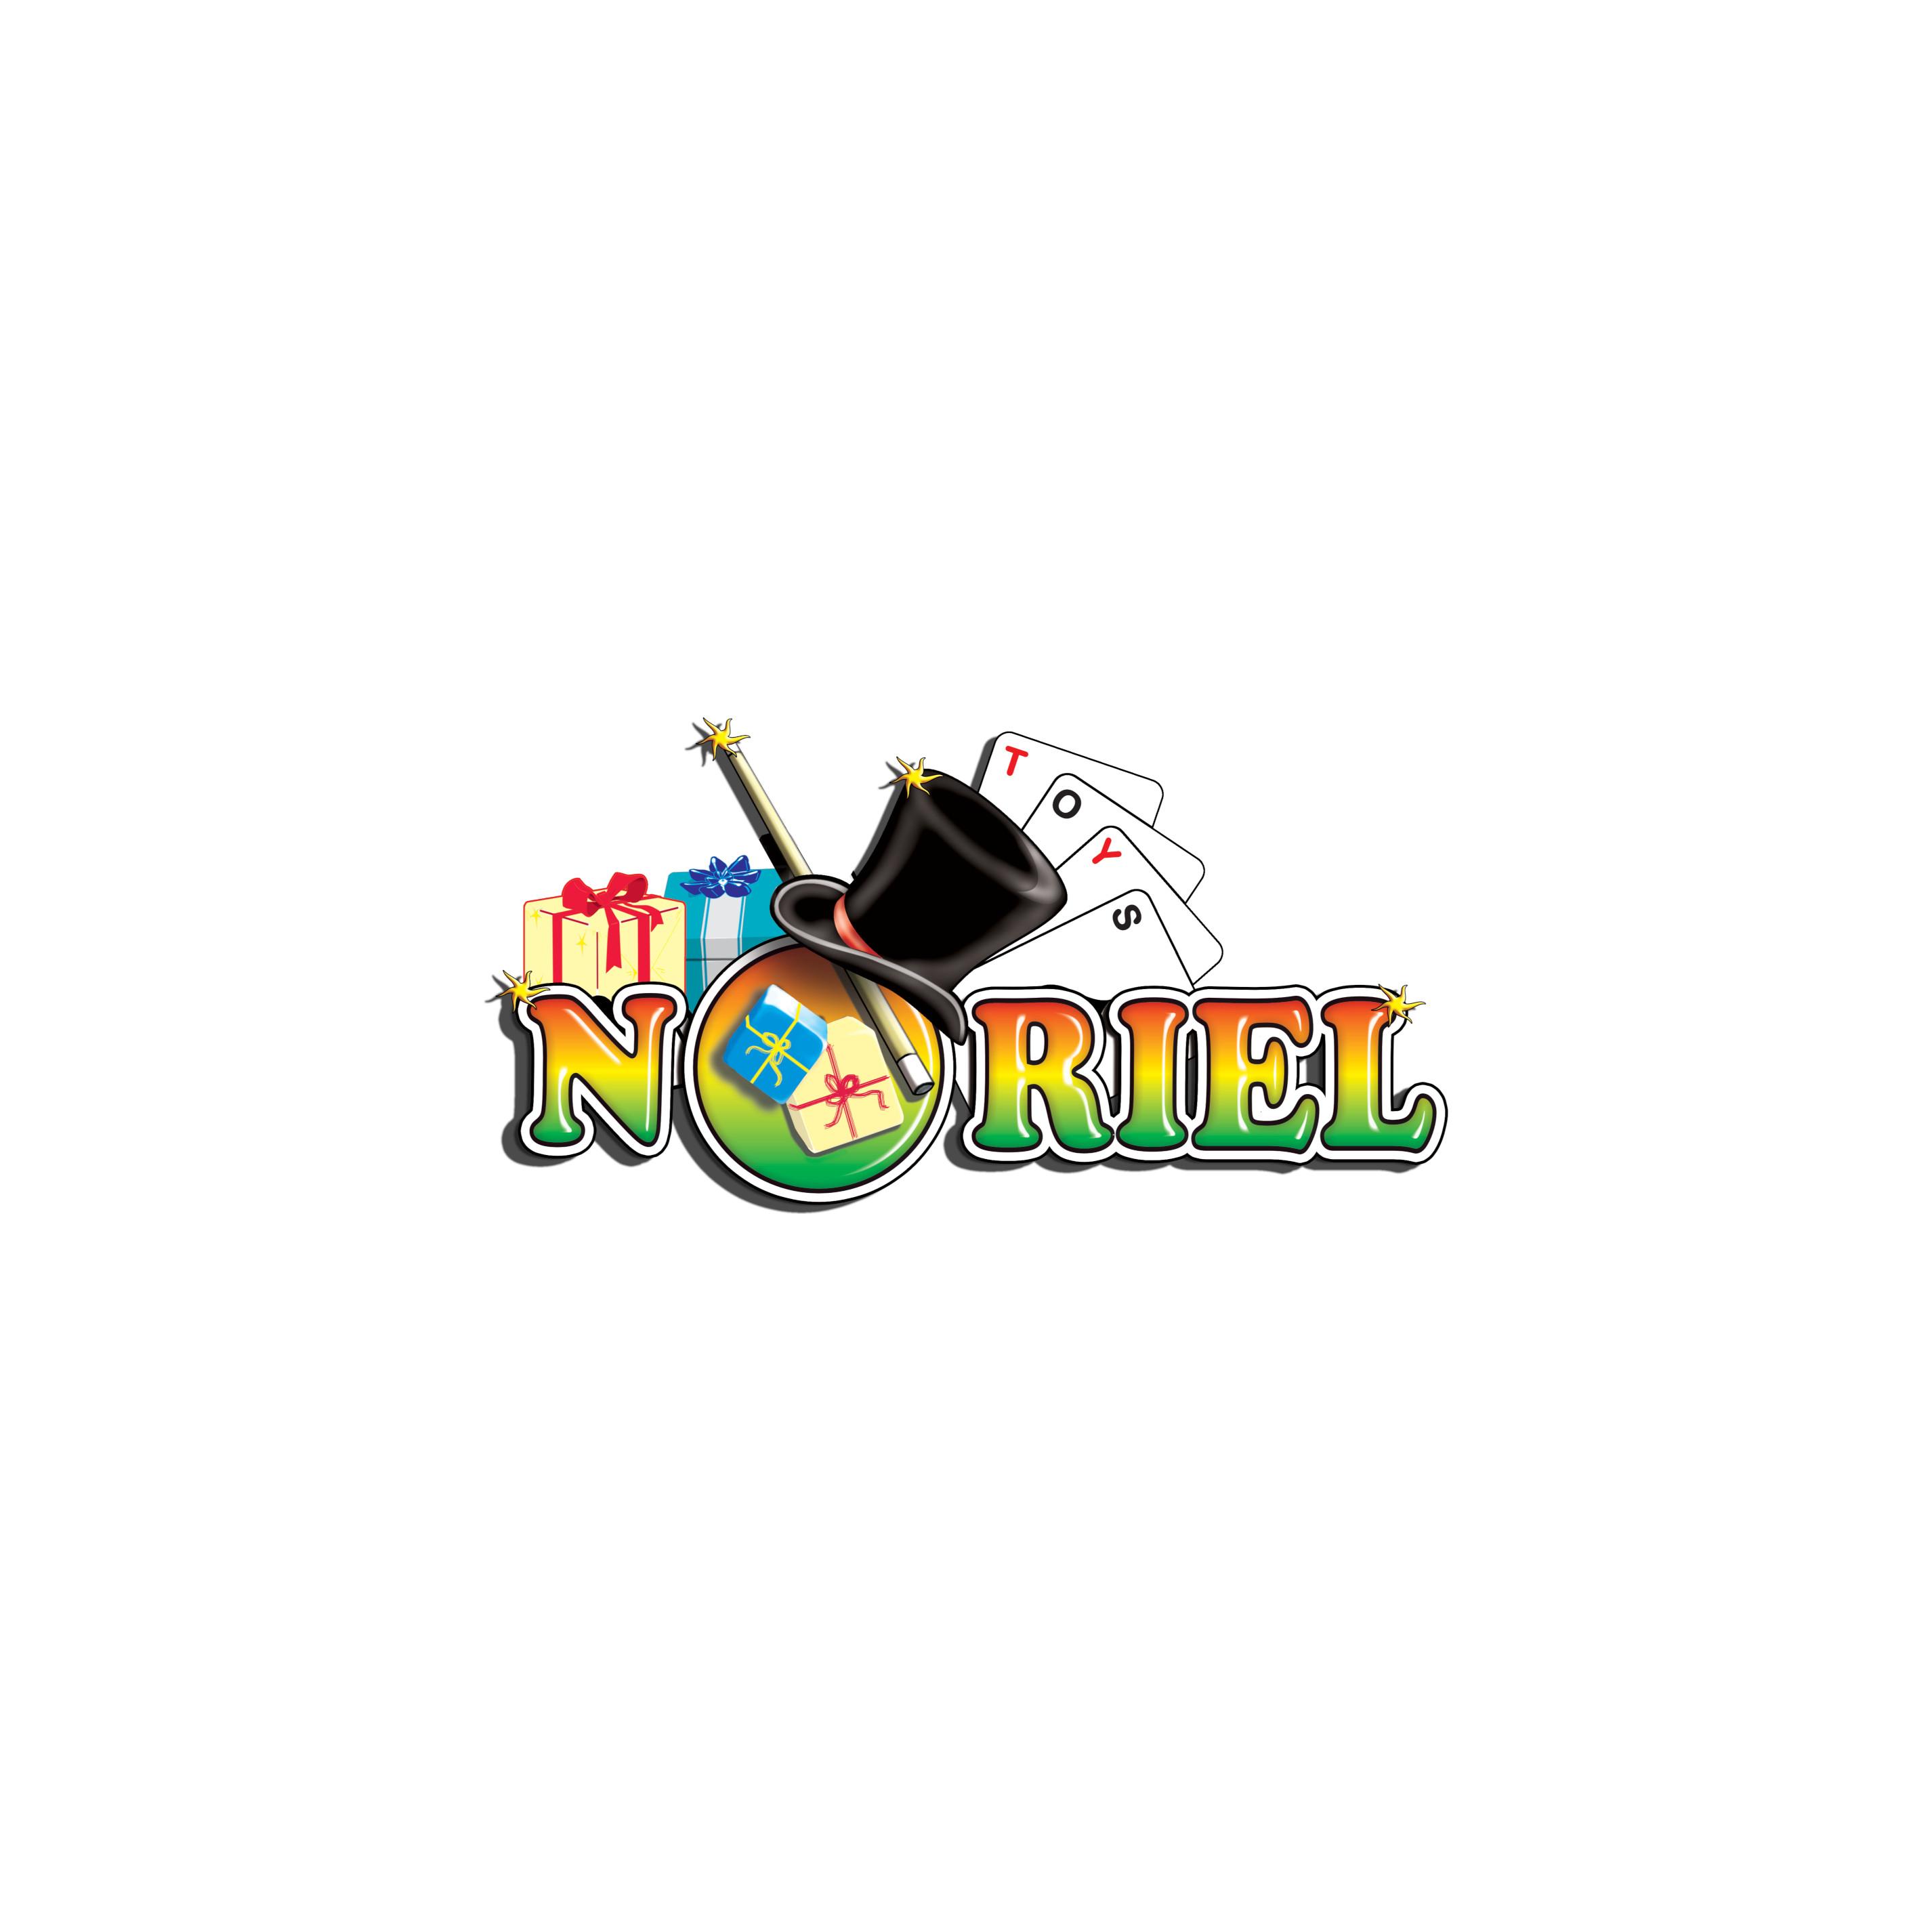 DK000570411_001w Set stickere Thomas and Friends, 10 x 22 cm